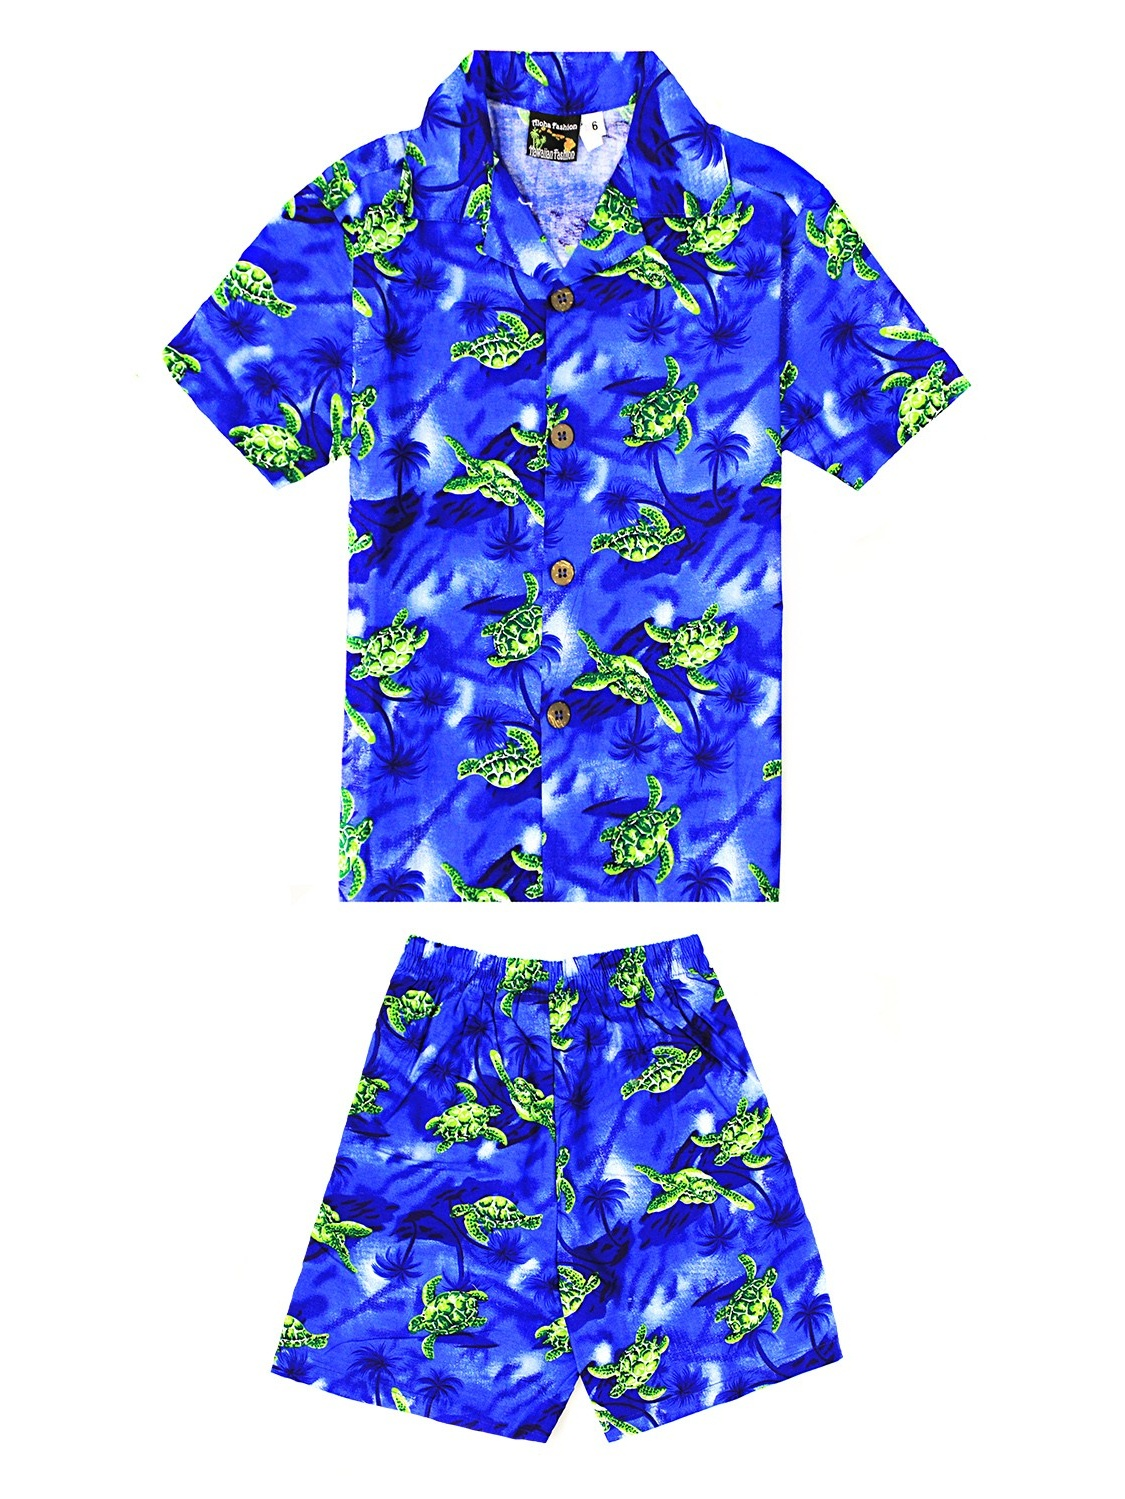 Boy Hawaiian Aloha Luau Shirt and Shorts 2 Piece Cabana Set in Blue with Green Turtles 4